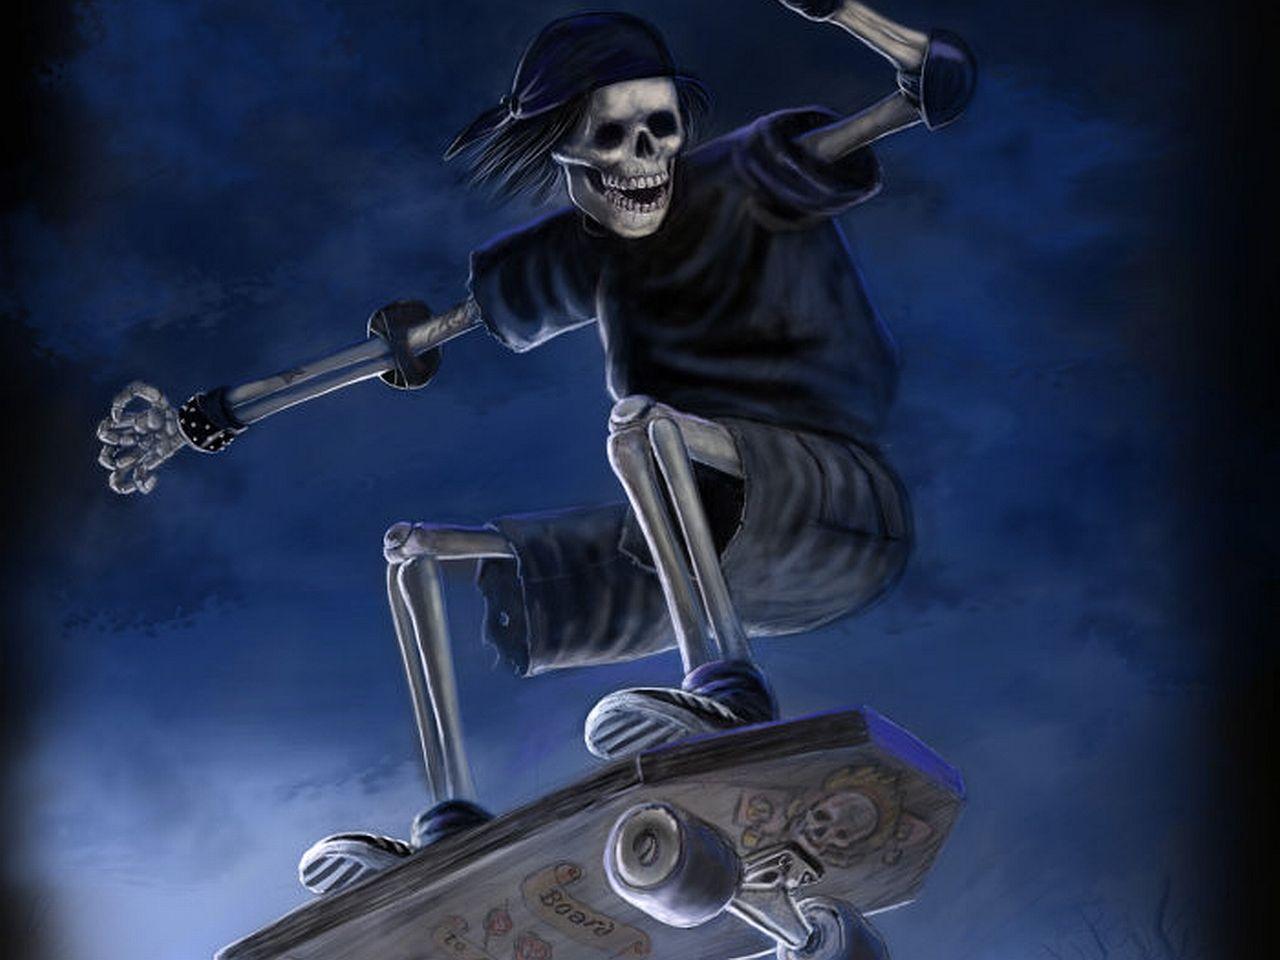 Halloween skeletons wallpapers wallpaper cave - Skeleton wallpaper ...